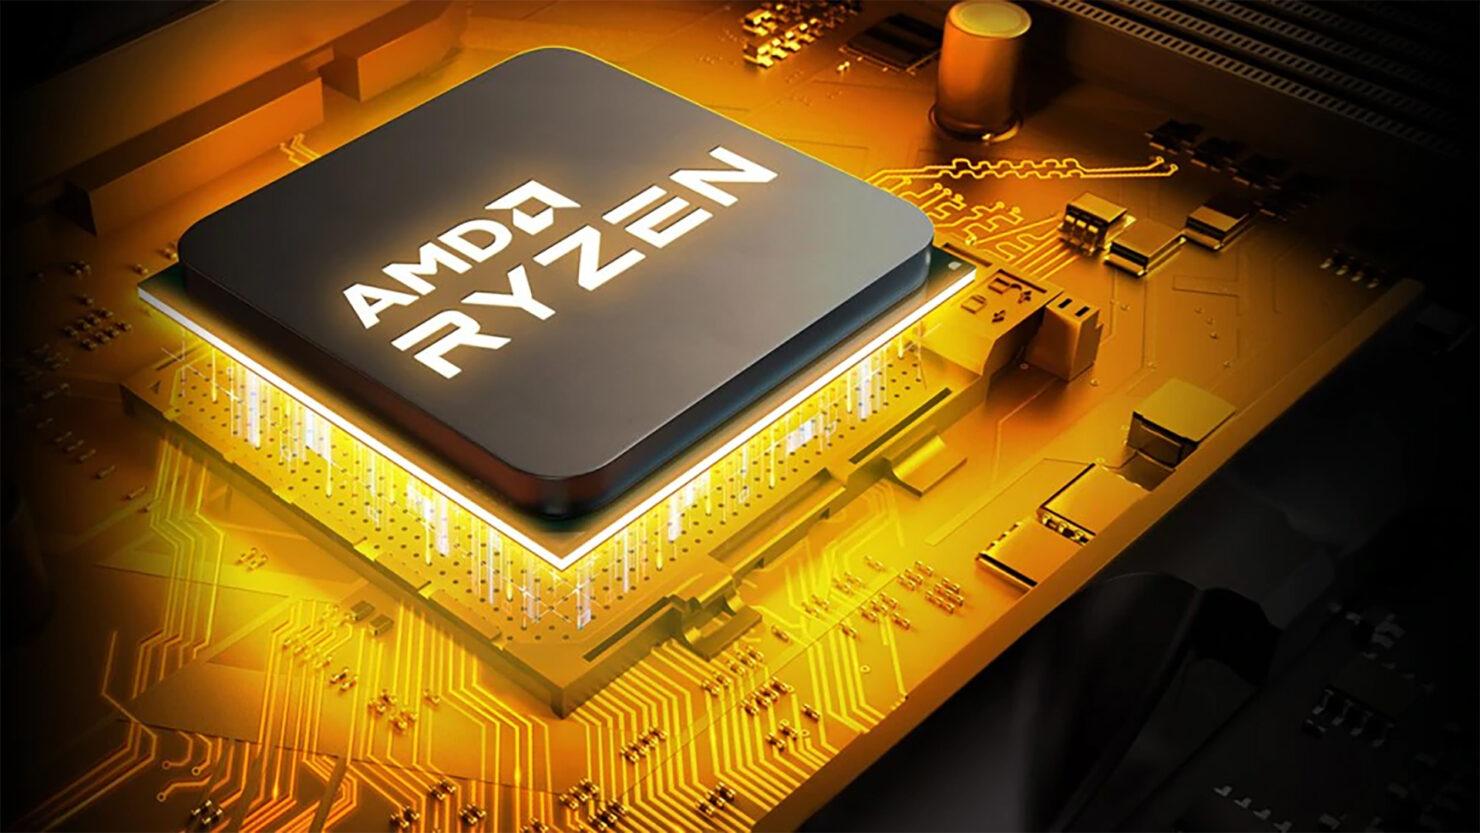 AMD Ryzen AM5 Desktop CPU APU Platform 600-series motherboards